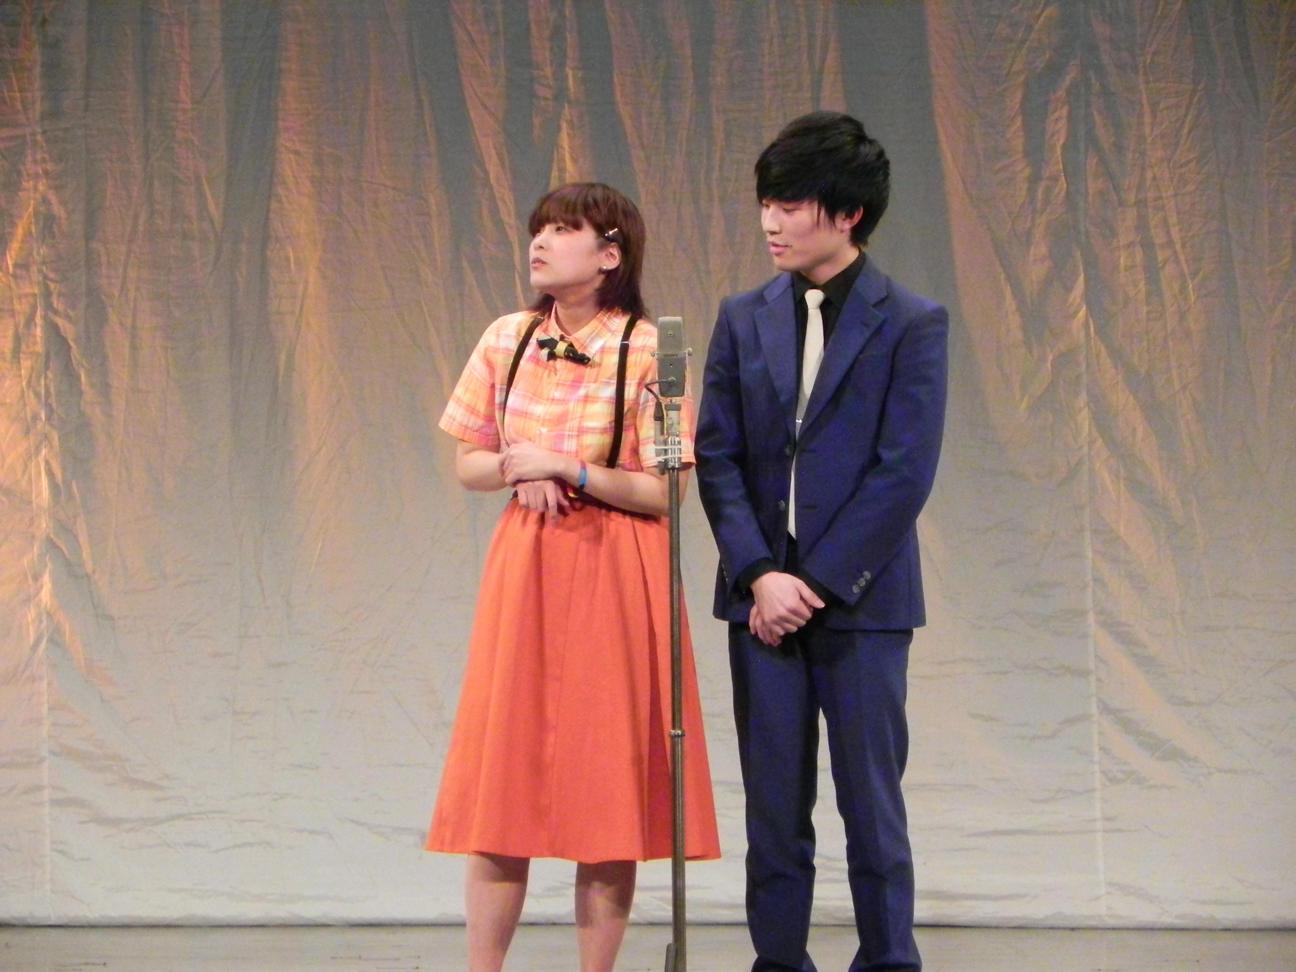 http://news.yoshimoto.co.jp/20170228144134-3be1a803a832caa3f5cf8fe565e19f0134eb8d99.jpg